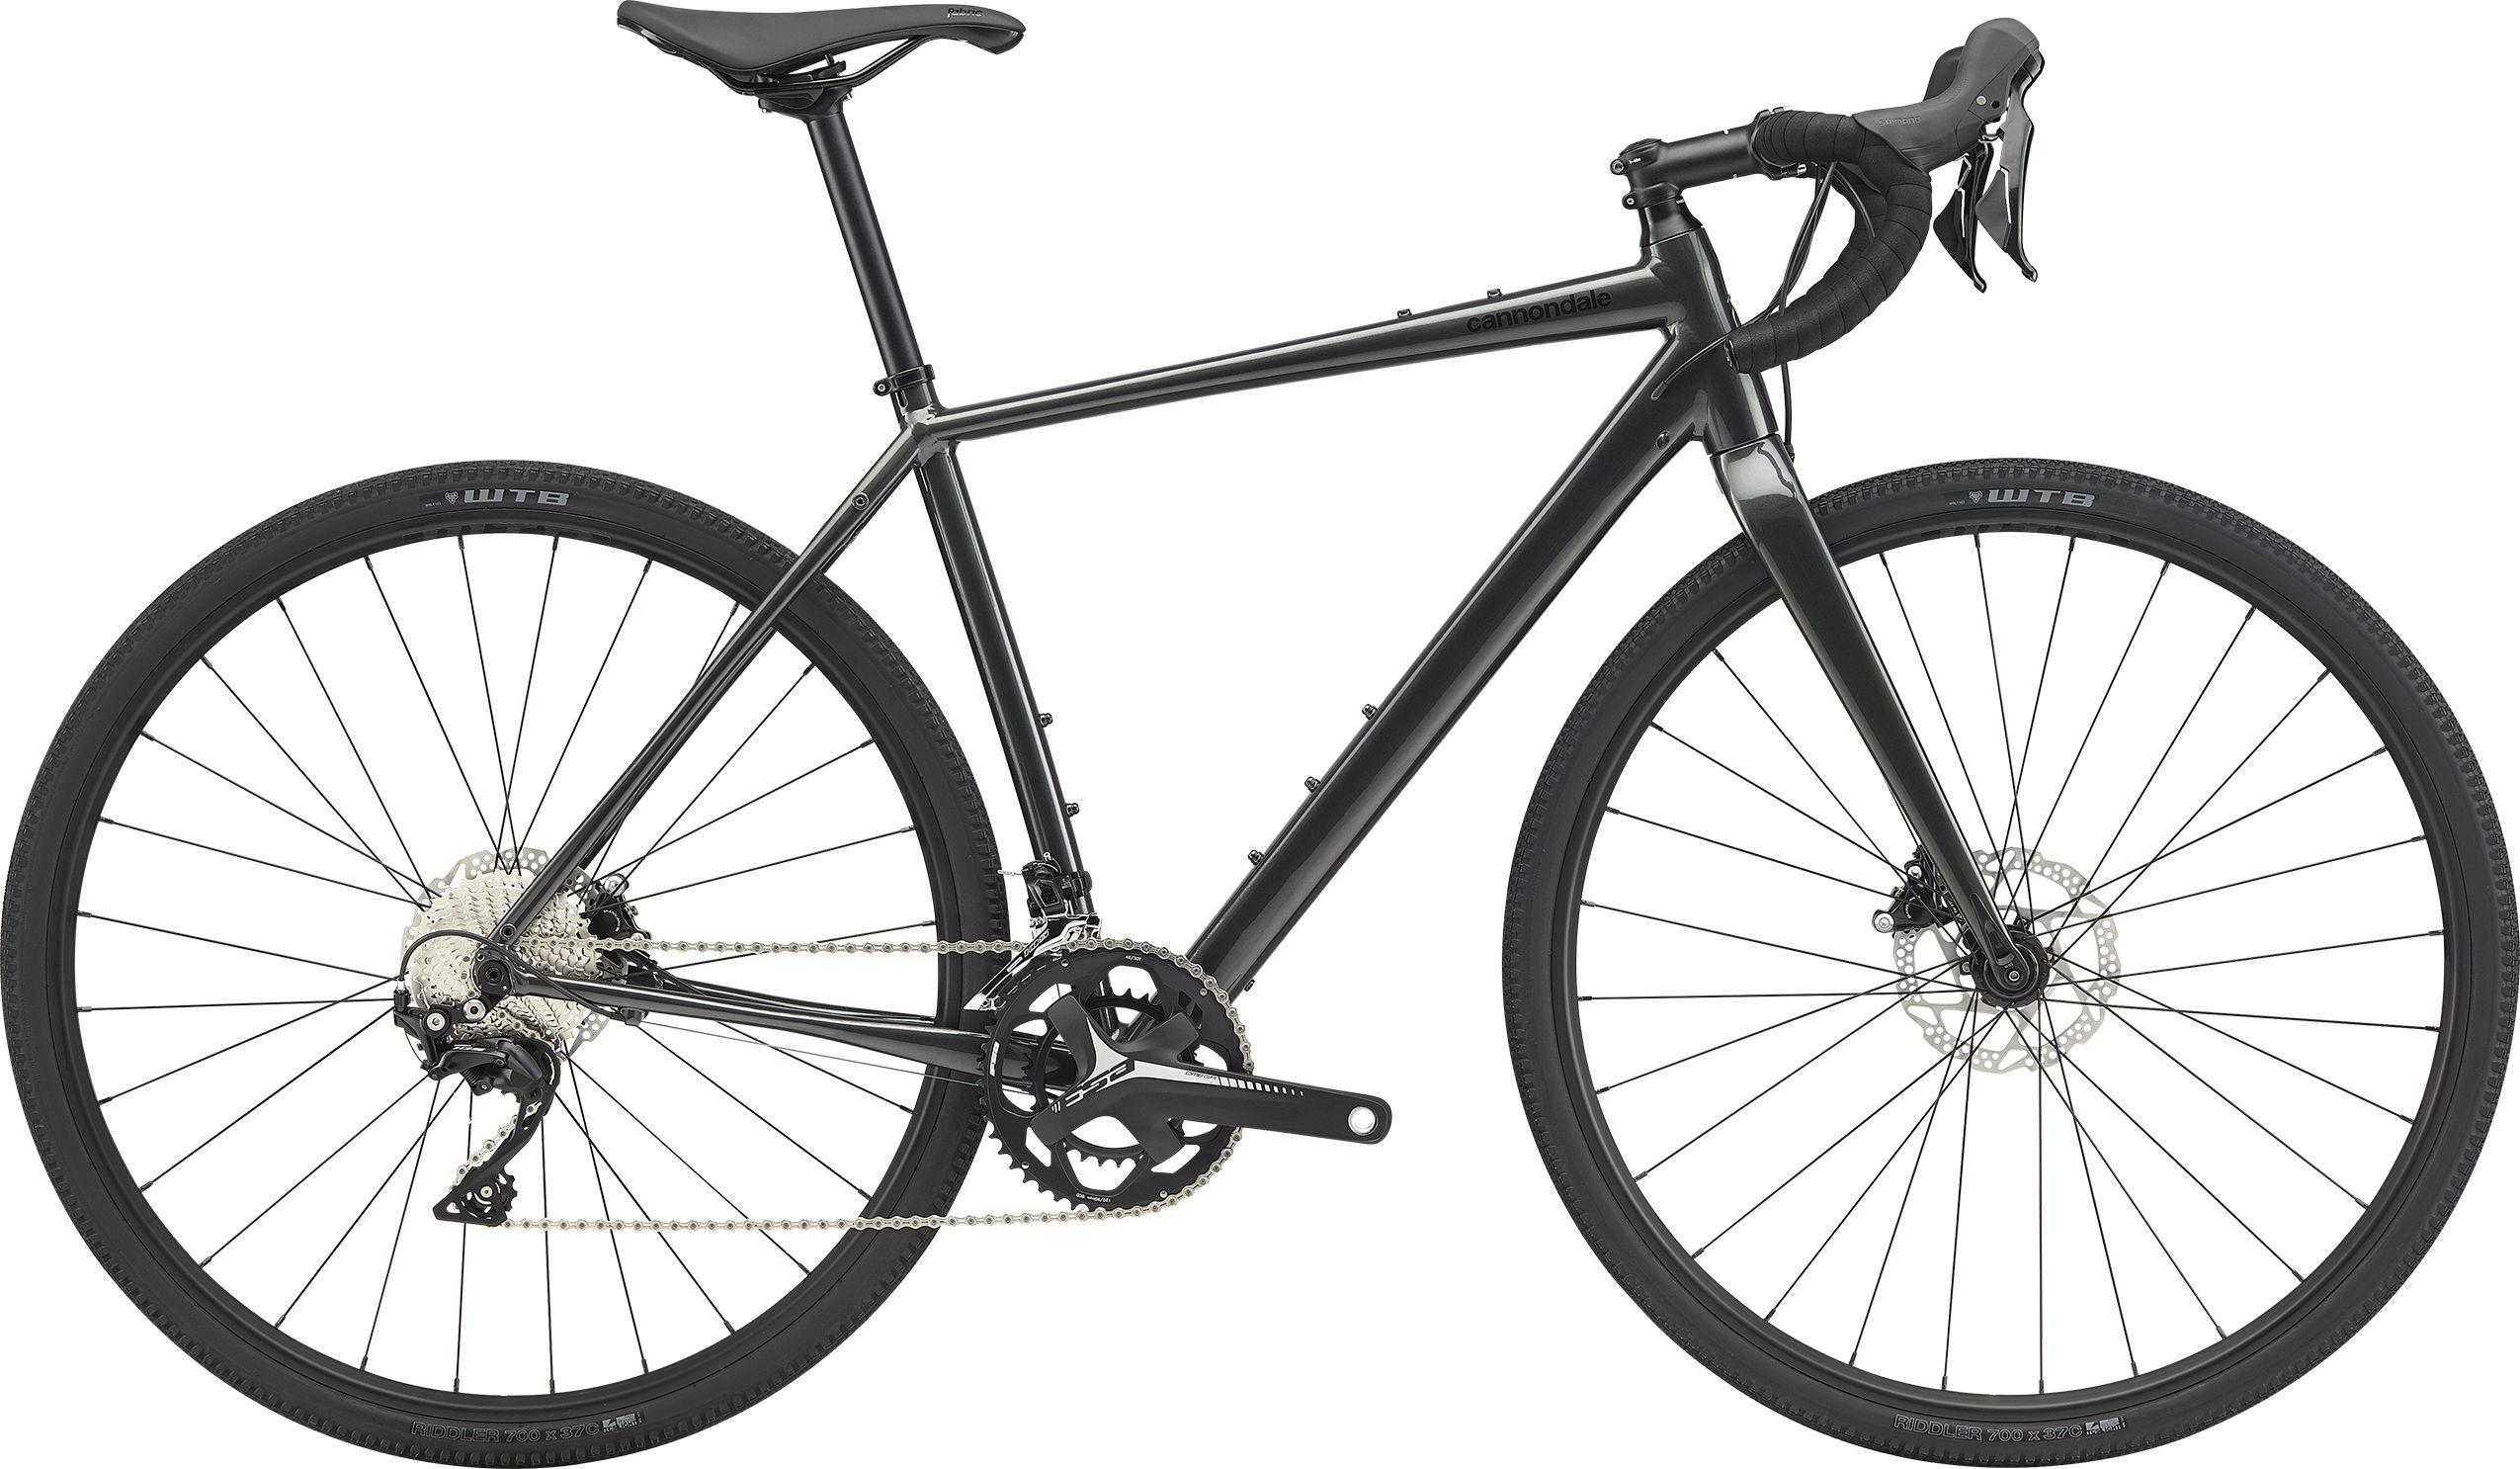 Cannondale Topstone 105 Women's Gravel Bike 2020 | Racercykler